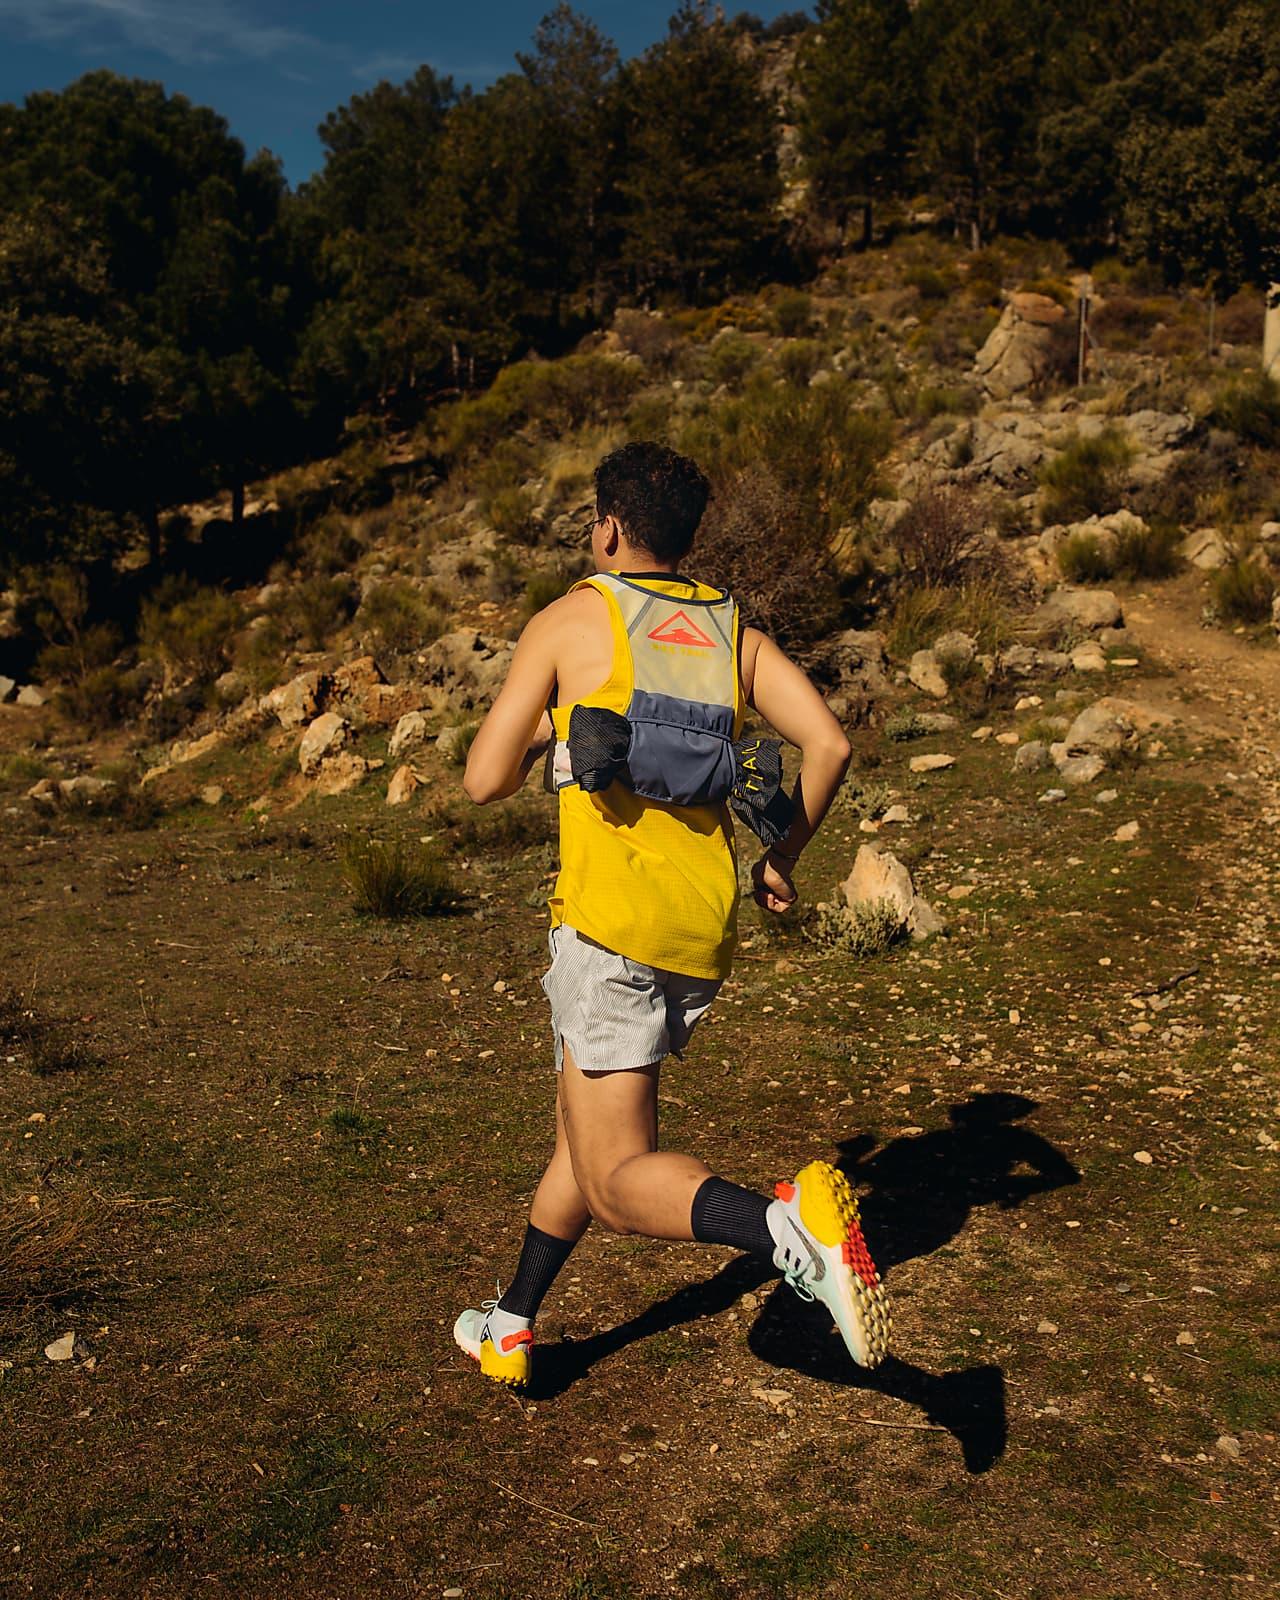 Papà Richiedente ritardo  Nike Men's Running Trail Gilet. Nike GB